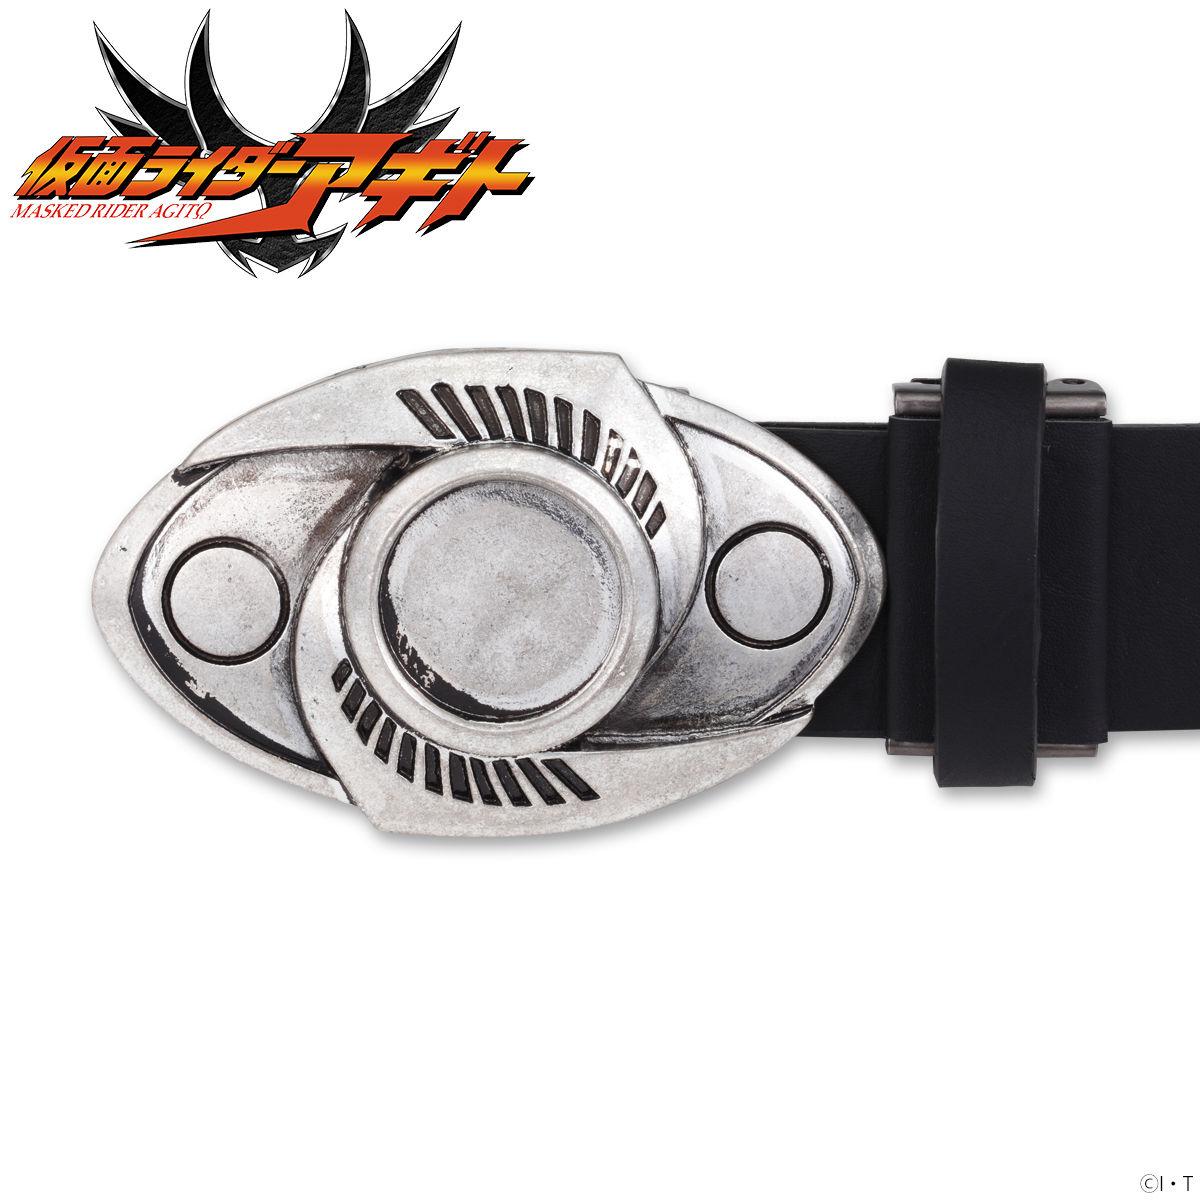 Heisei Kamen Rider Casual-Style Transformation Belt (From Kuuga to Decade)